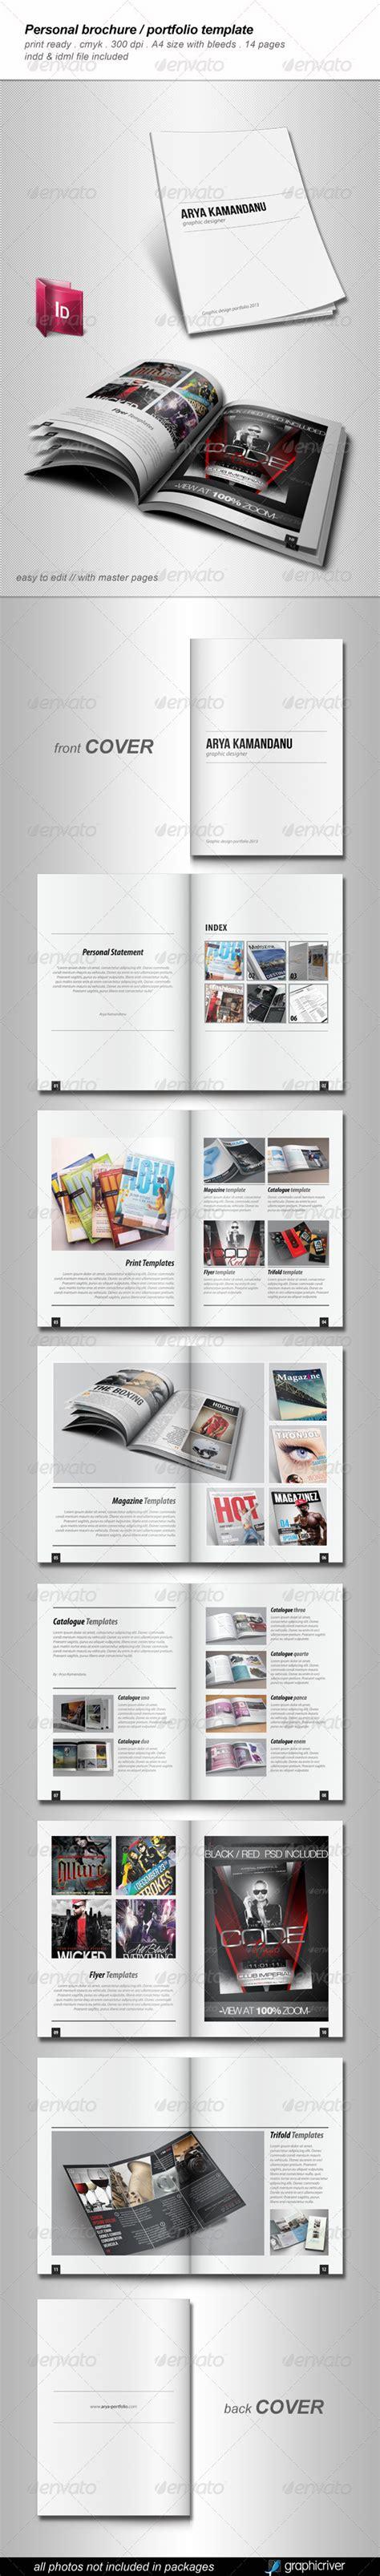 portfolio print template indesign a3 portfolio template 187 dondrup